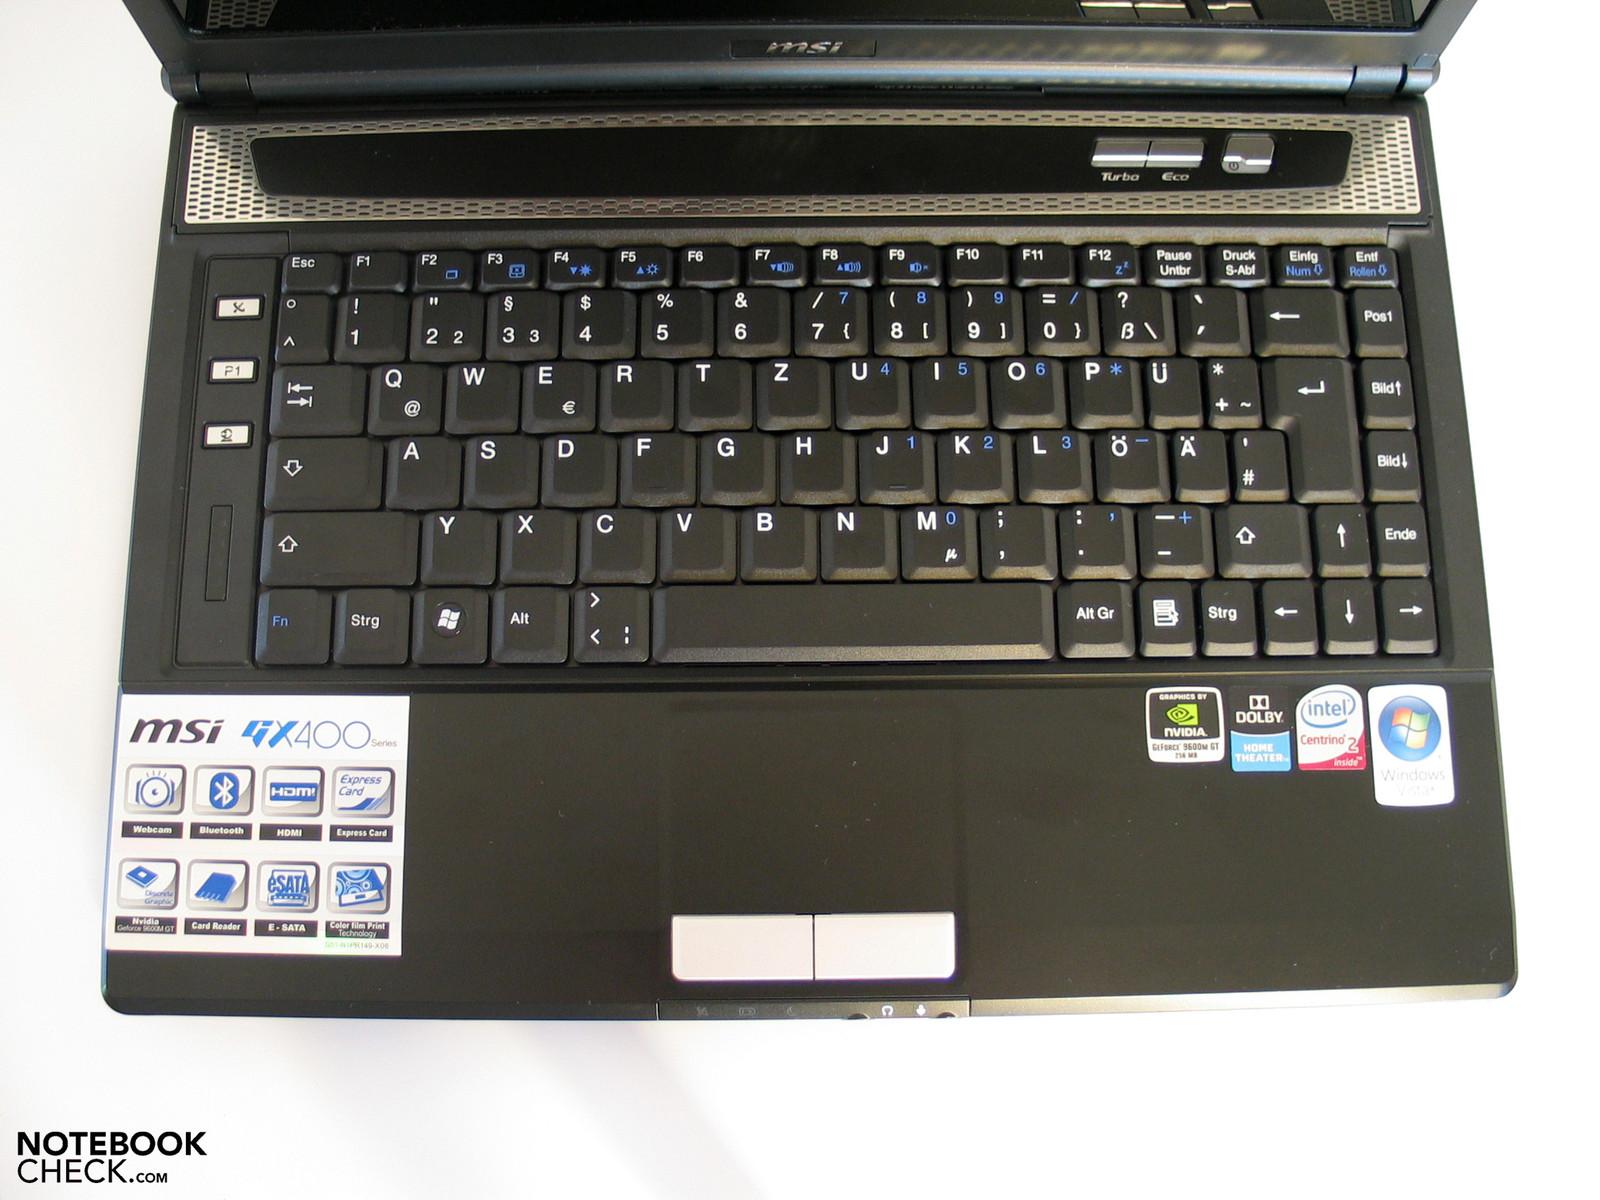 MSI GX400 Intel WLAN Driver for Mac